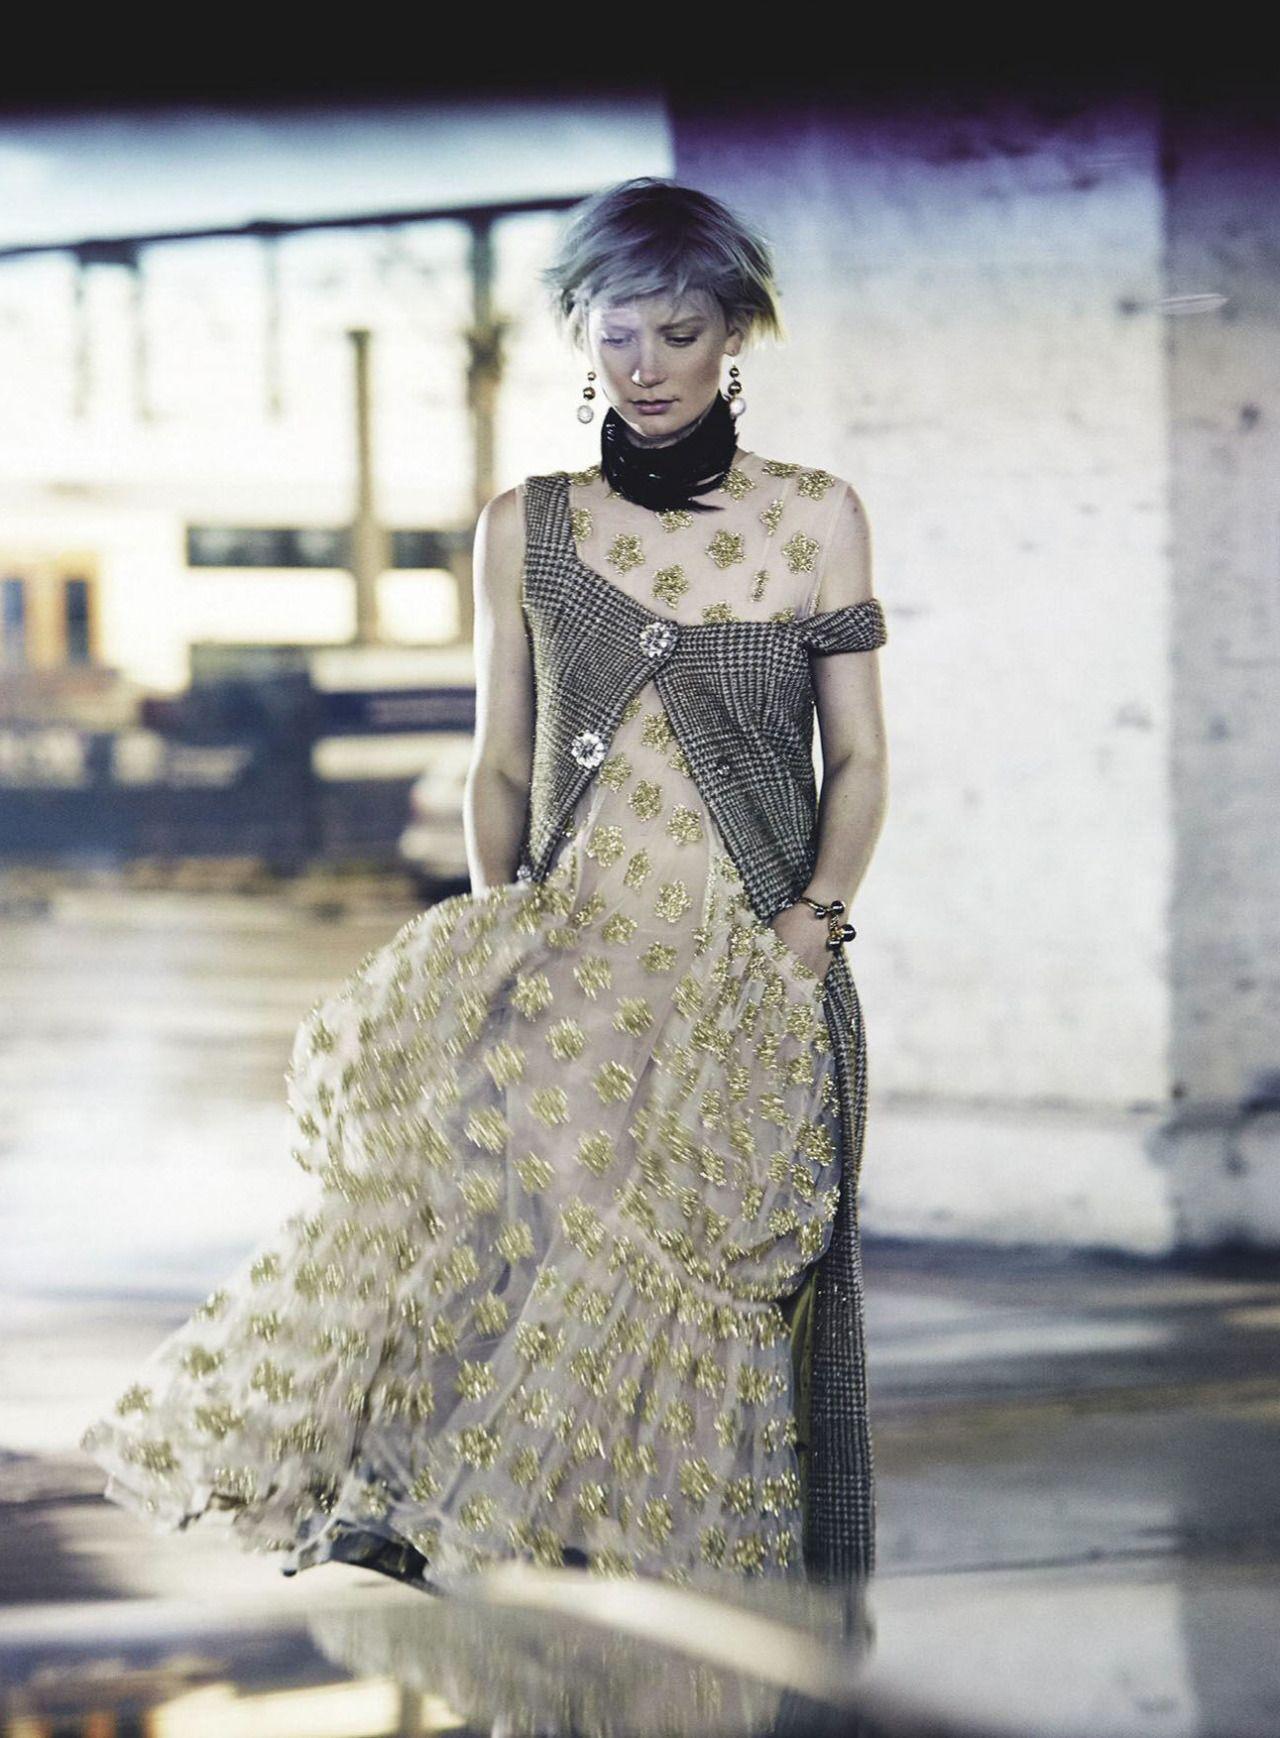 Publication: Vogue Australia July 2016 Model: Mia Wasikowska Photographer: Nicole Bentley Fashion Editor: Kate Darvill Hair: Sophie Roberts Make Up: Kellie Stratton